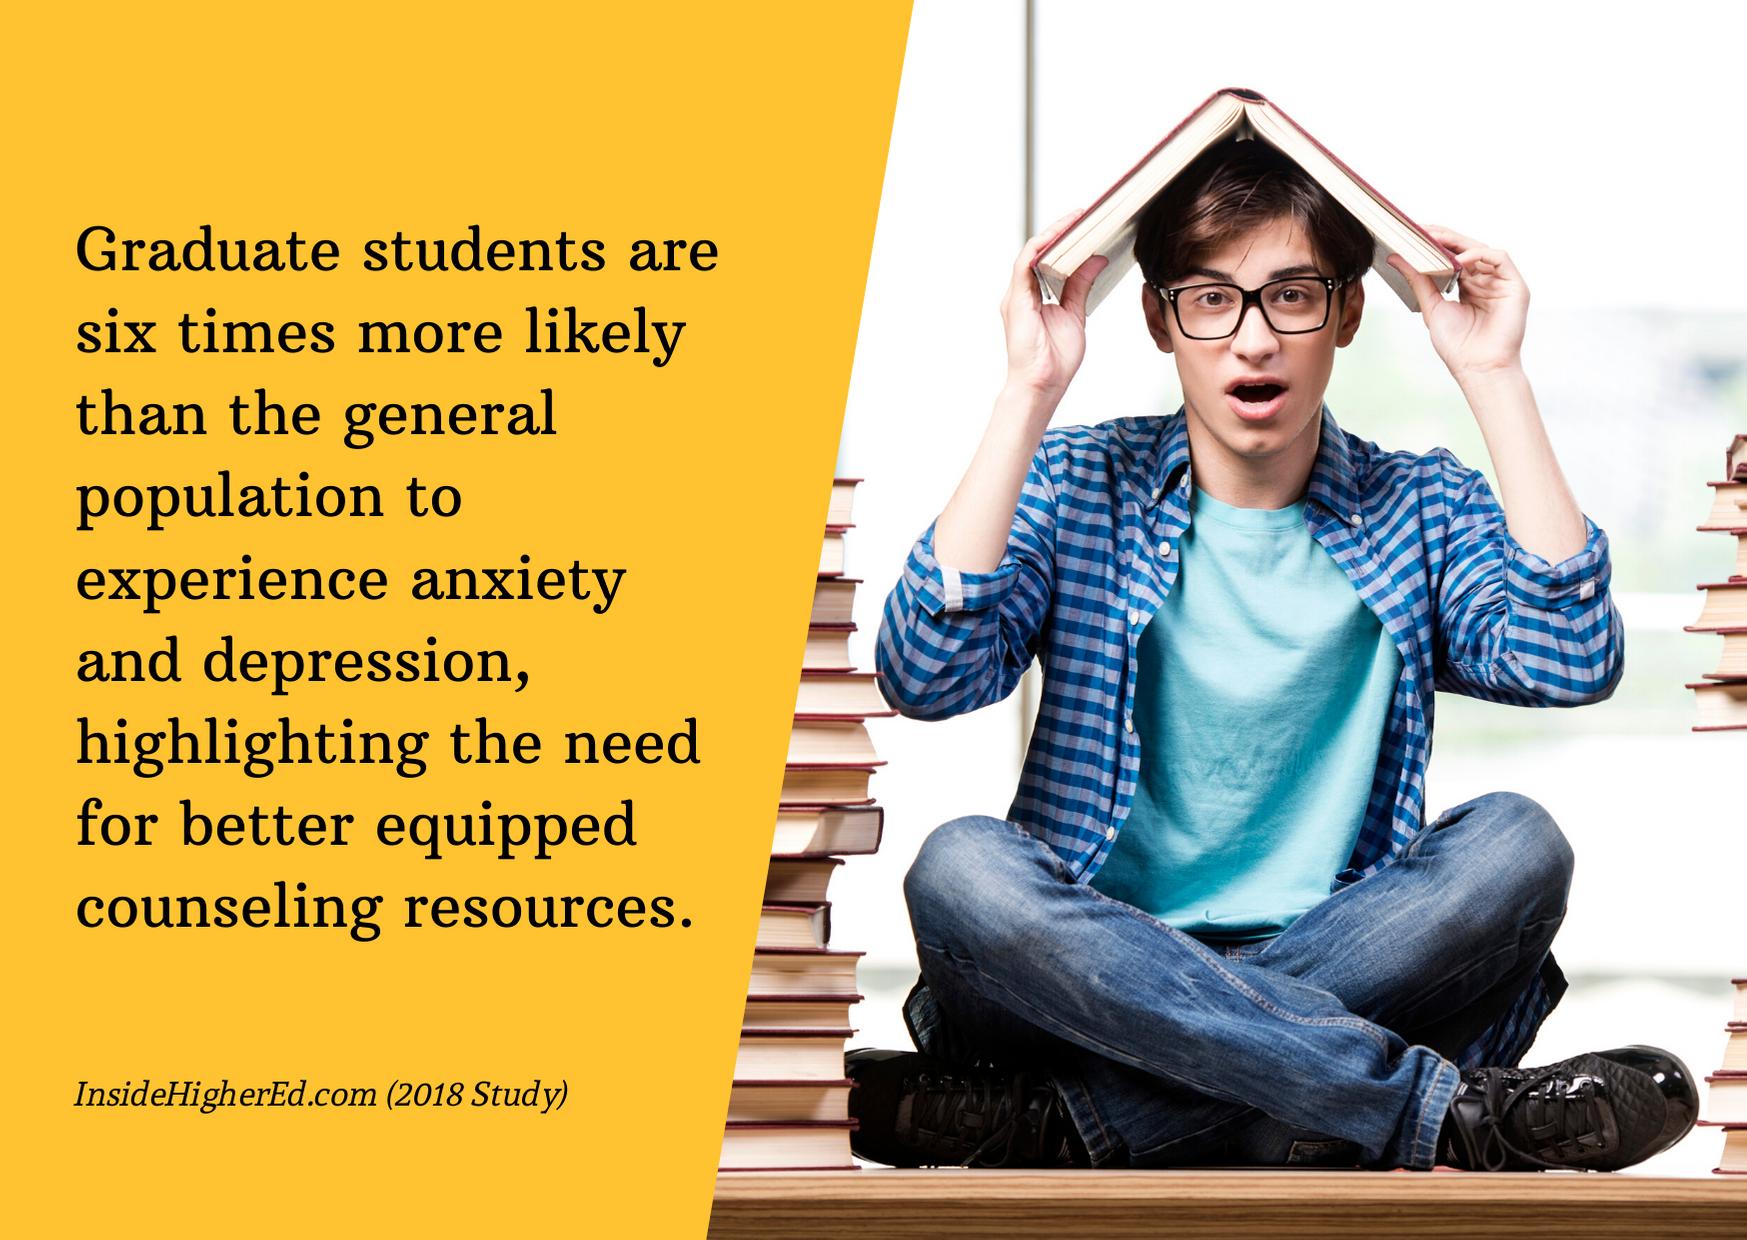 campus resources fact 4